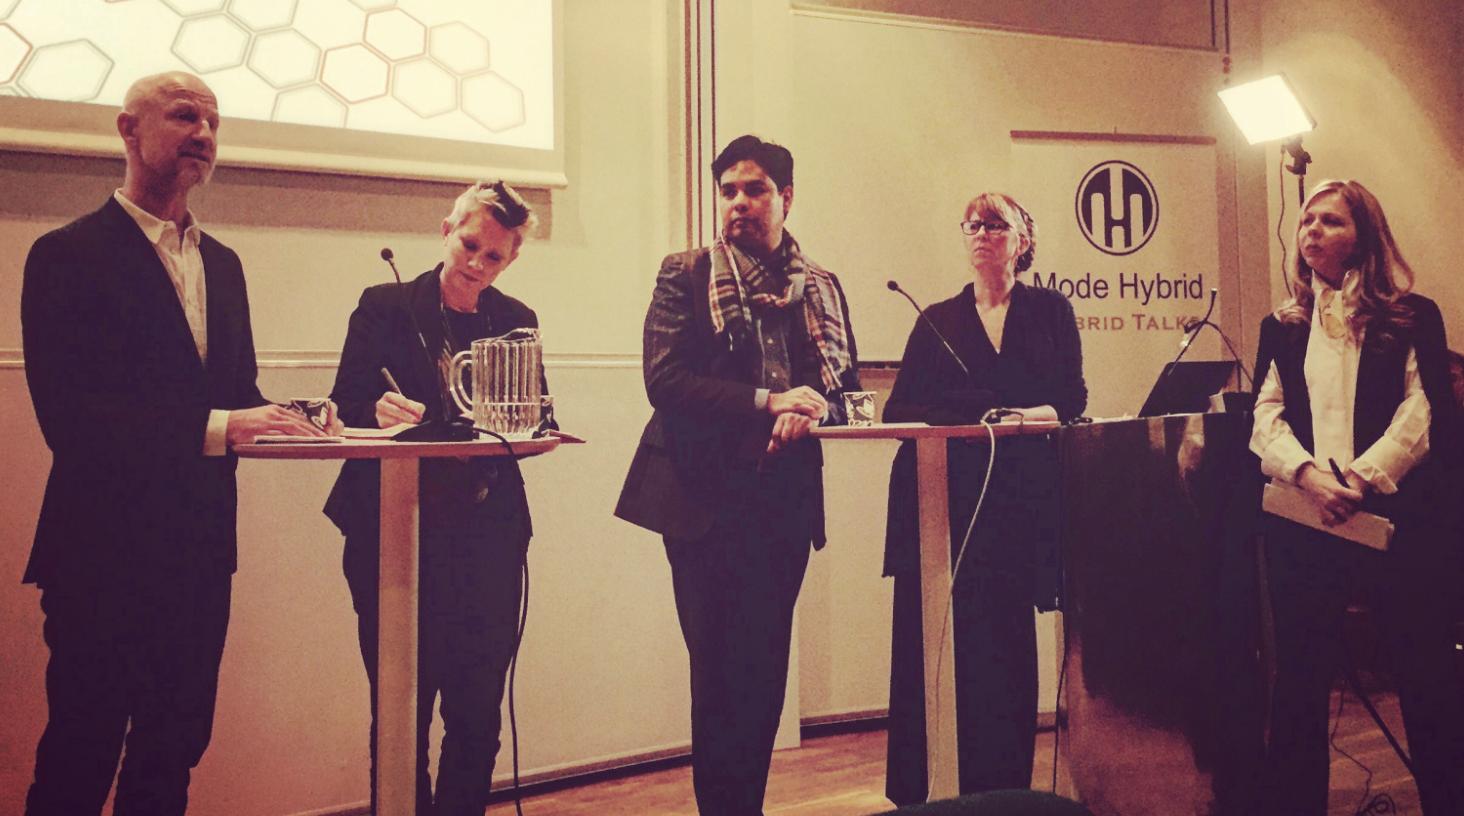 Hybrid Talking with Martin Johnson (left), Eduardo Escobedo, Susy Paisley and Annika Shelley